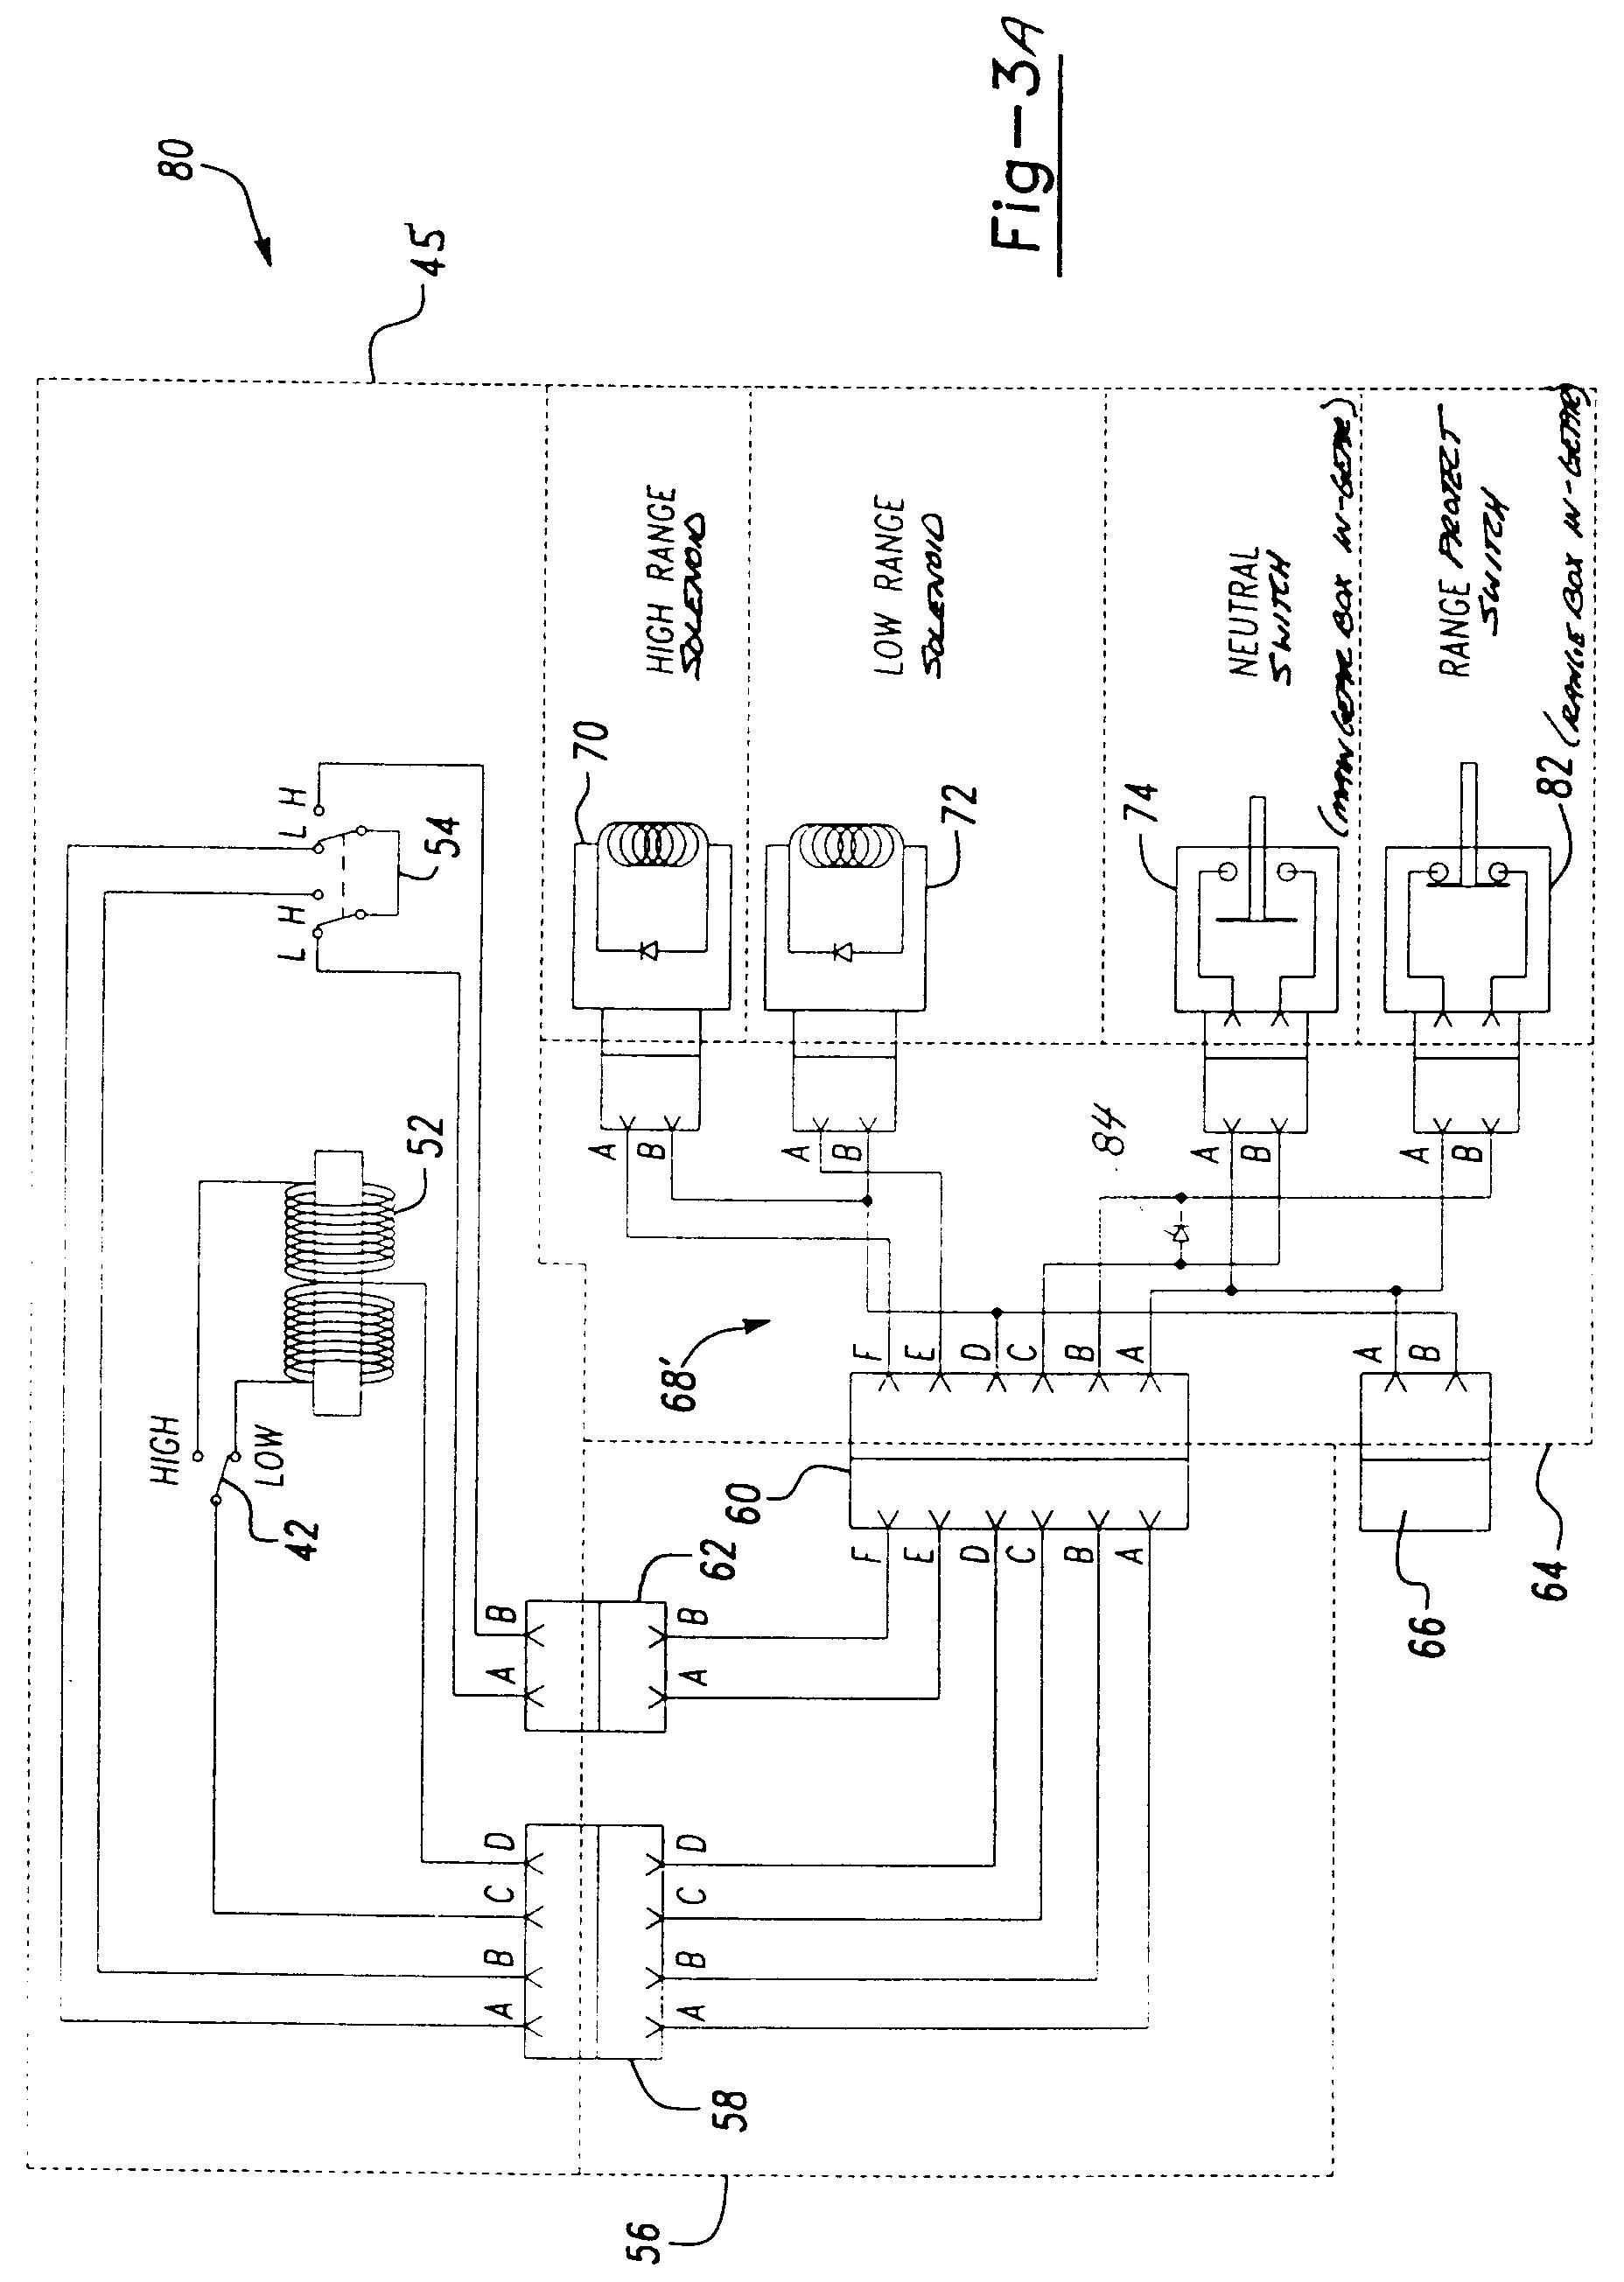 eaton 2 speed wiring diagram meritor transmission wiring diagram - 28 images - zf ...